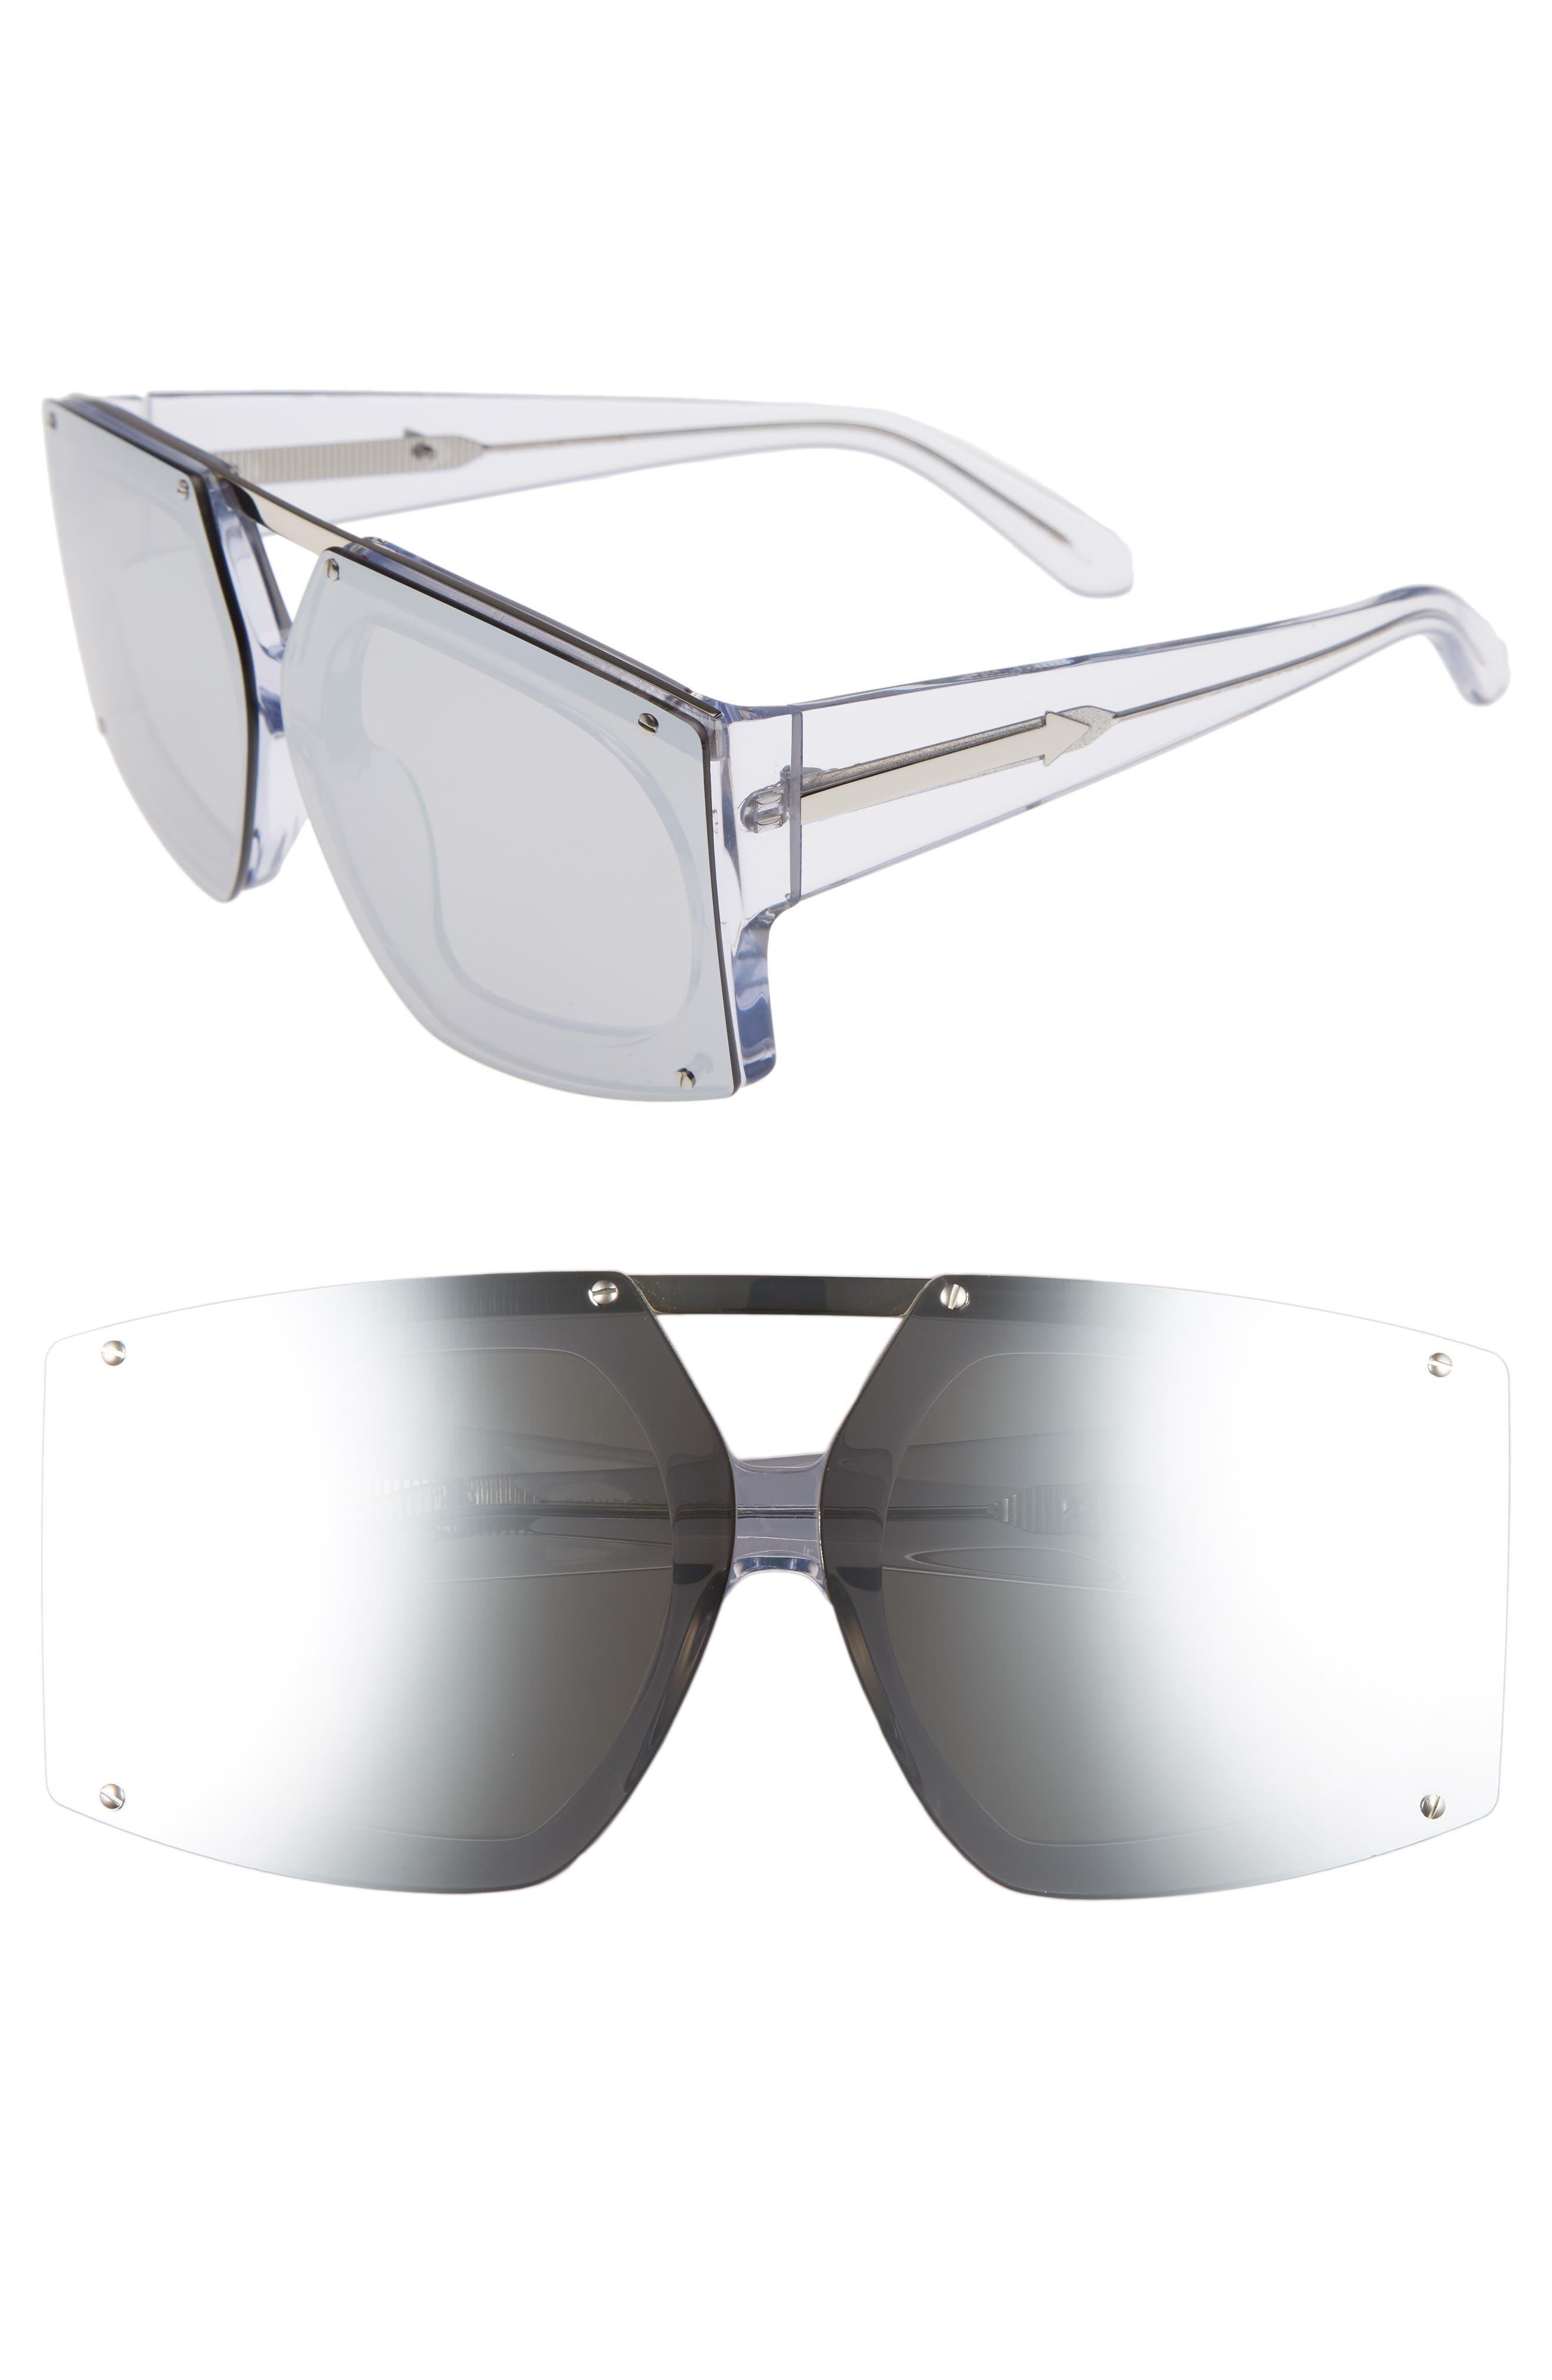 Karen Walker 70mm Mirrored Oversized Sunglasses